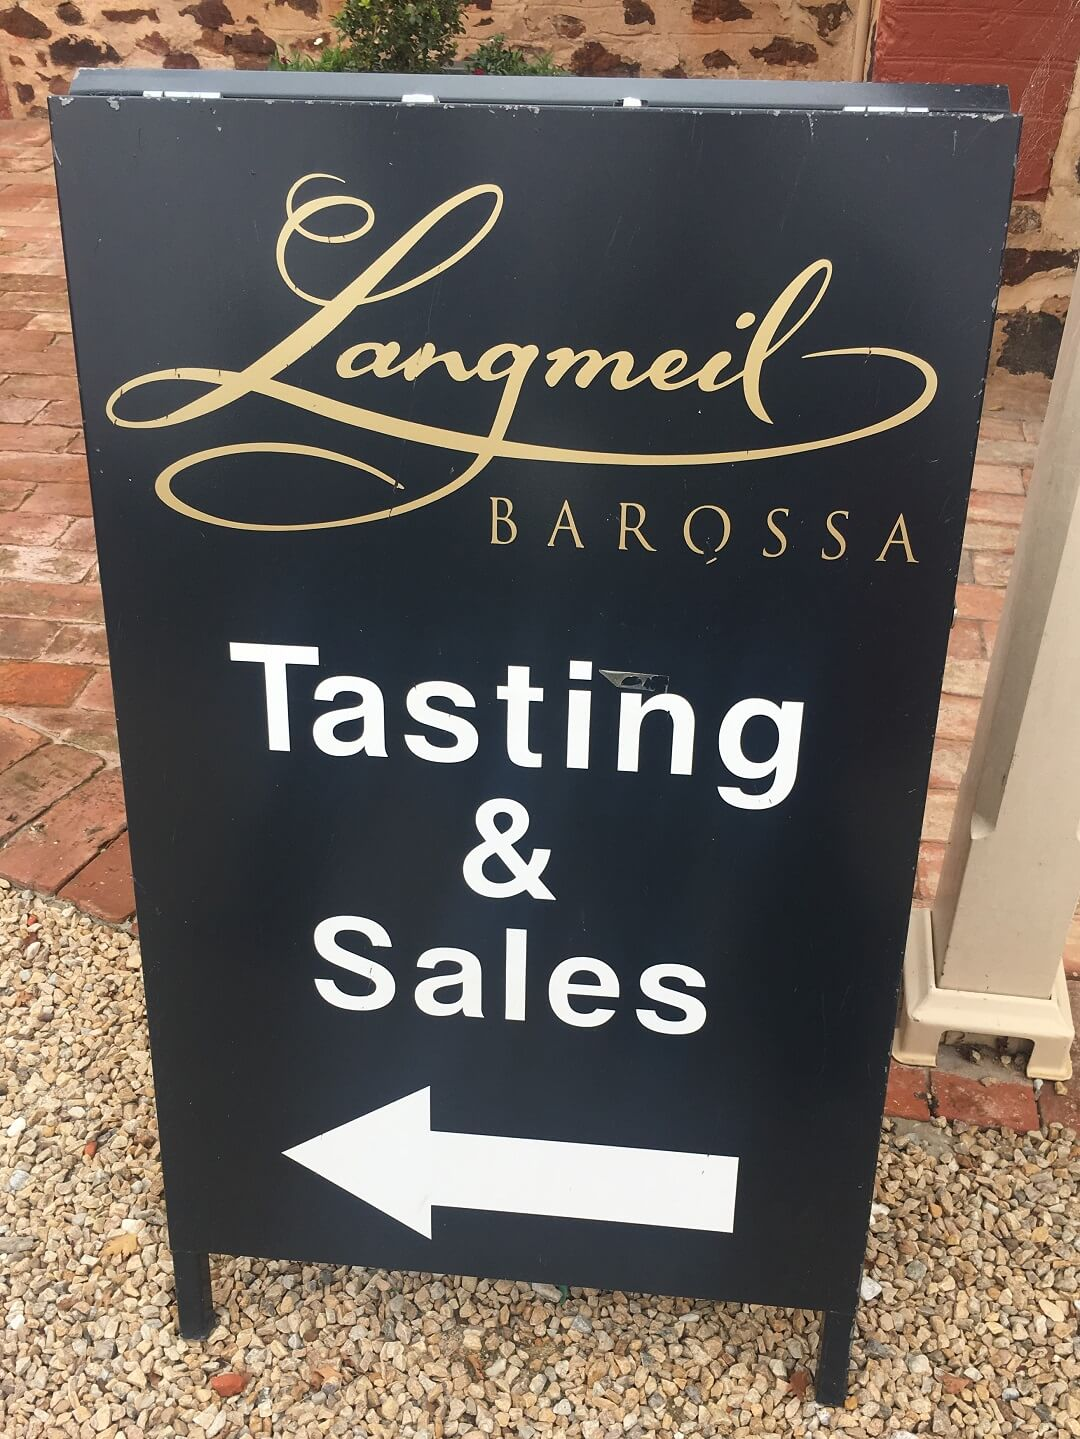 langmeil winery barossa valley australia